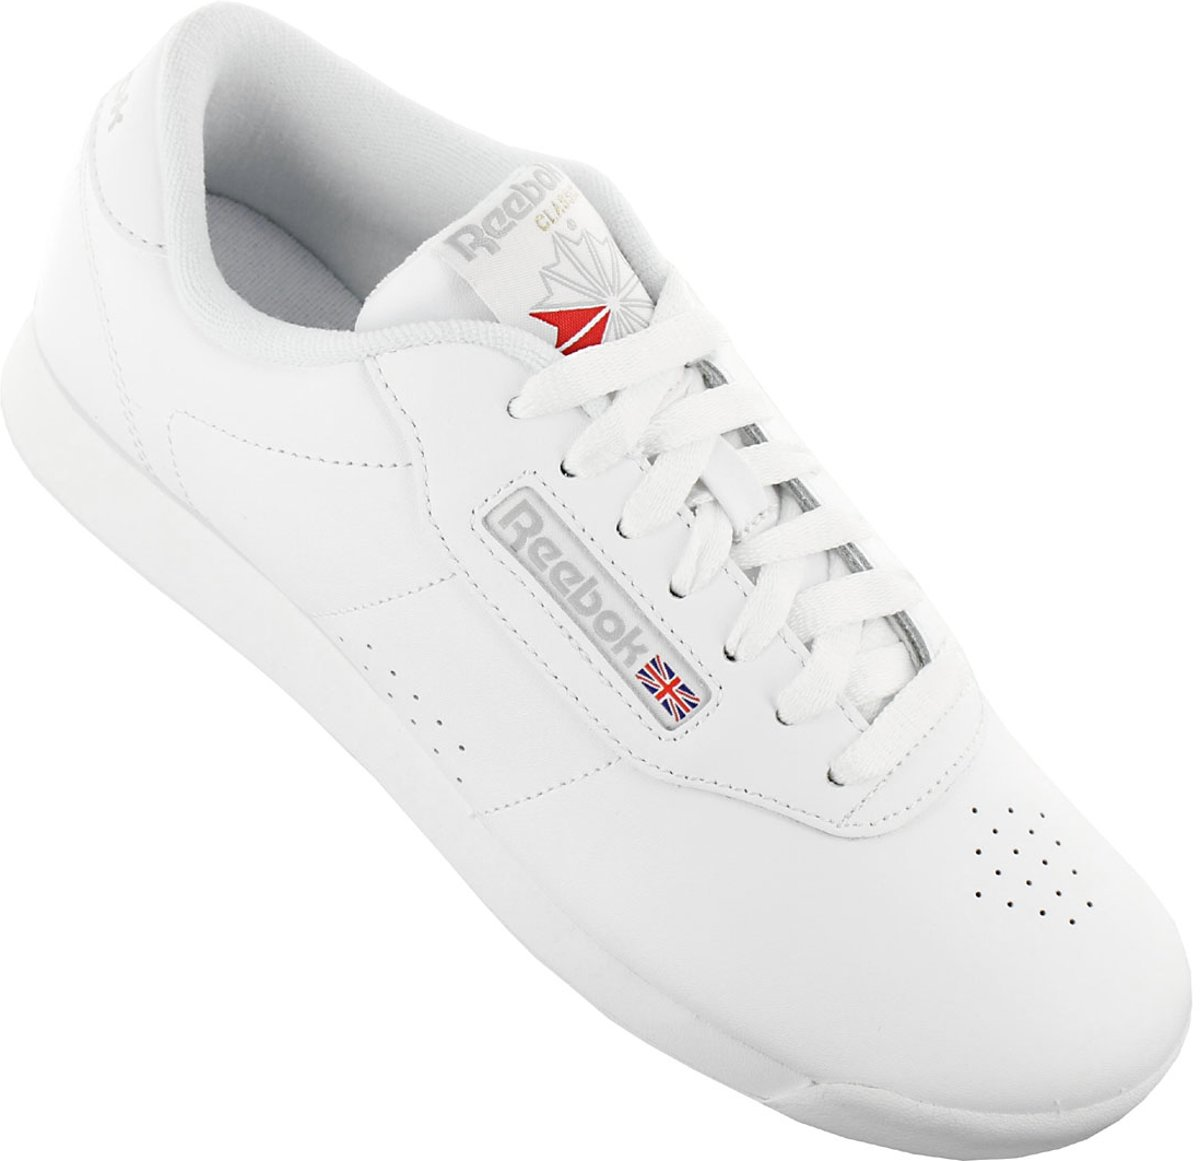 | Reebok Princess CN2212, Vrouwen, Wit, Sneakers